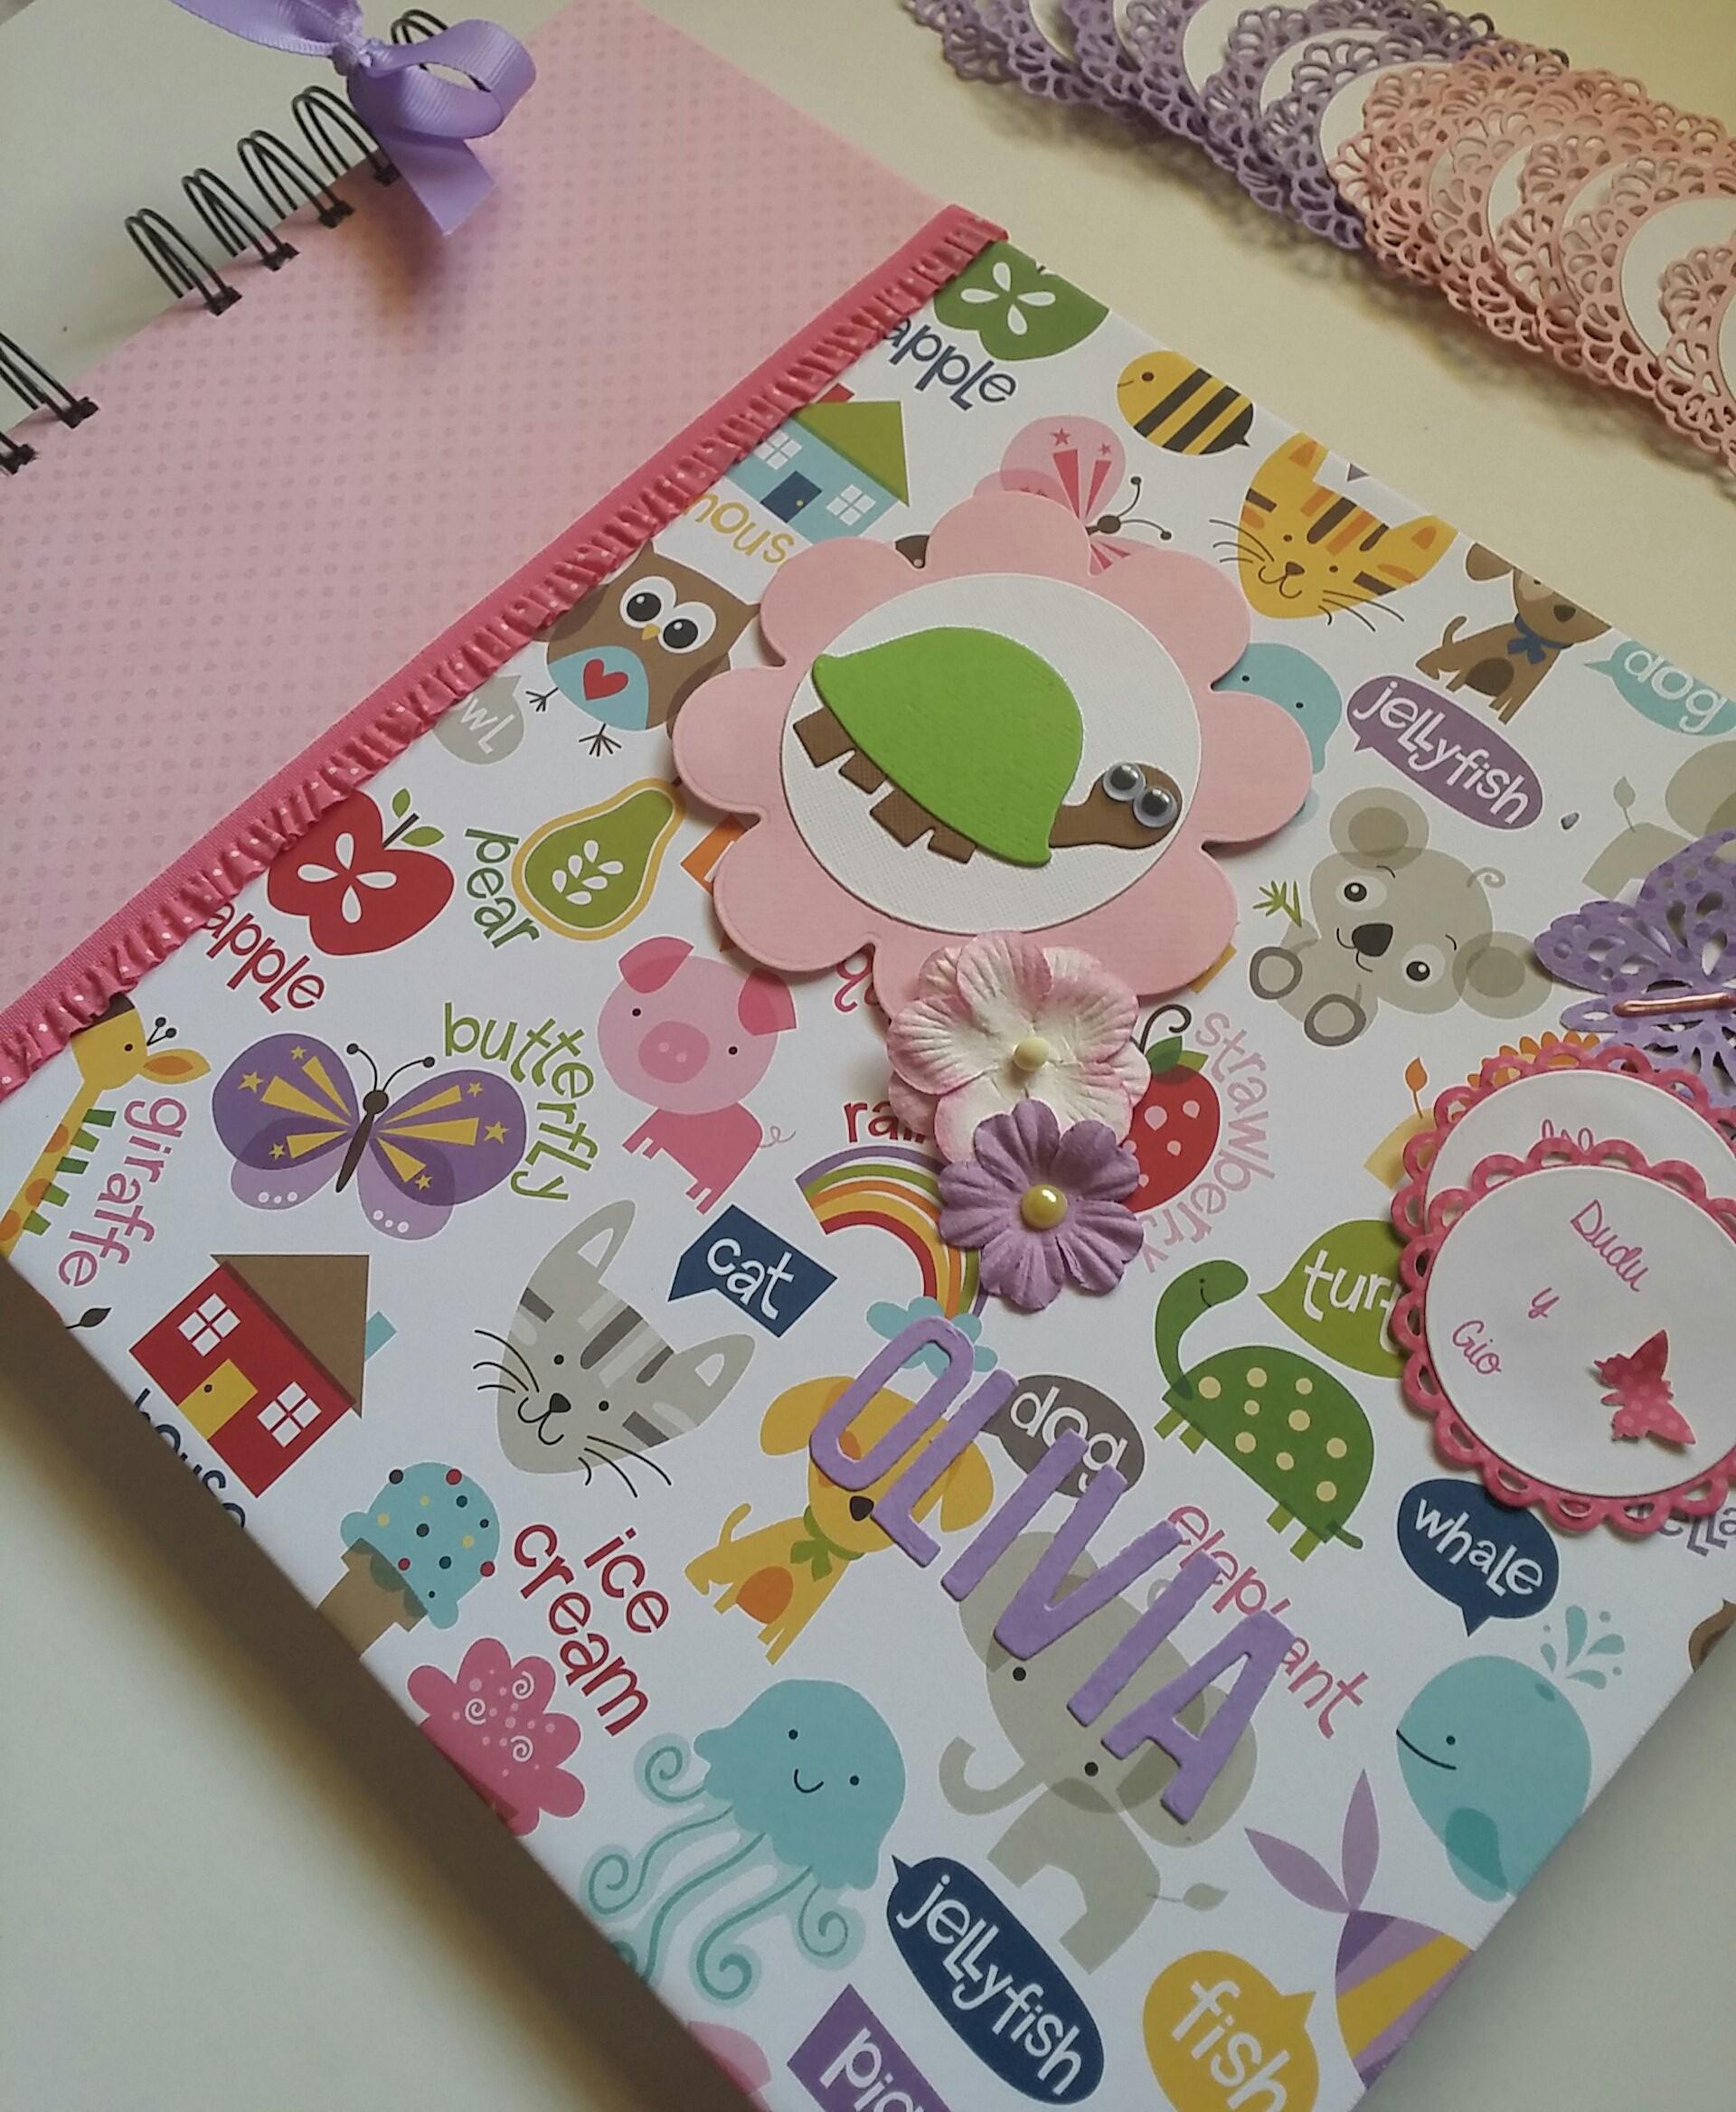 Decoracion de cuadernos escolares por dentro decorar for Decoracion de album de fotos